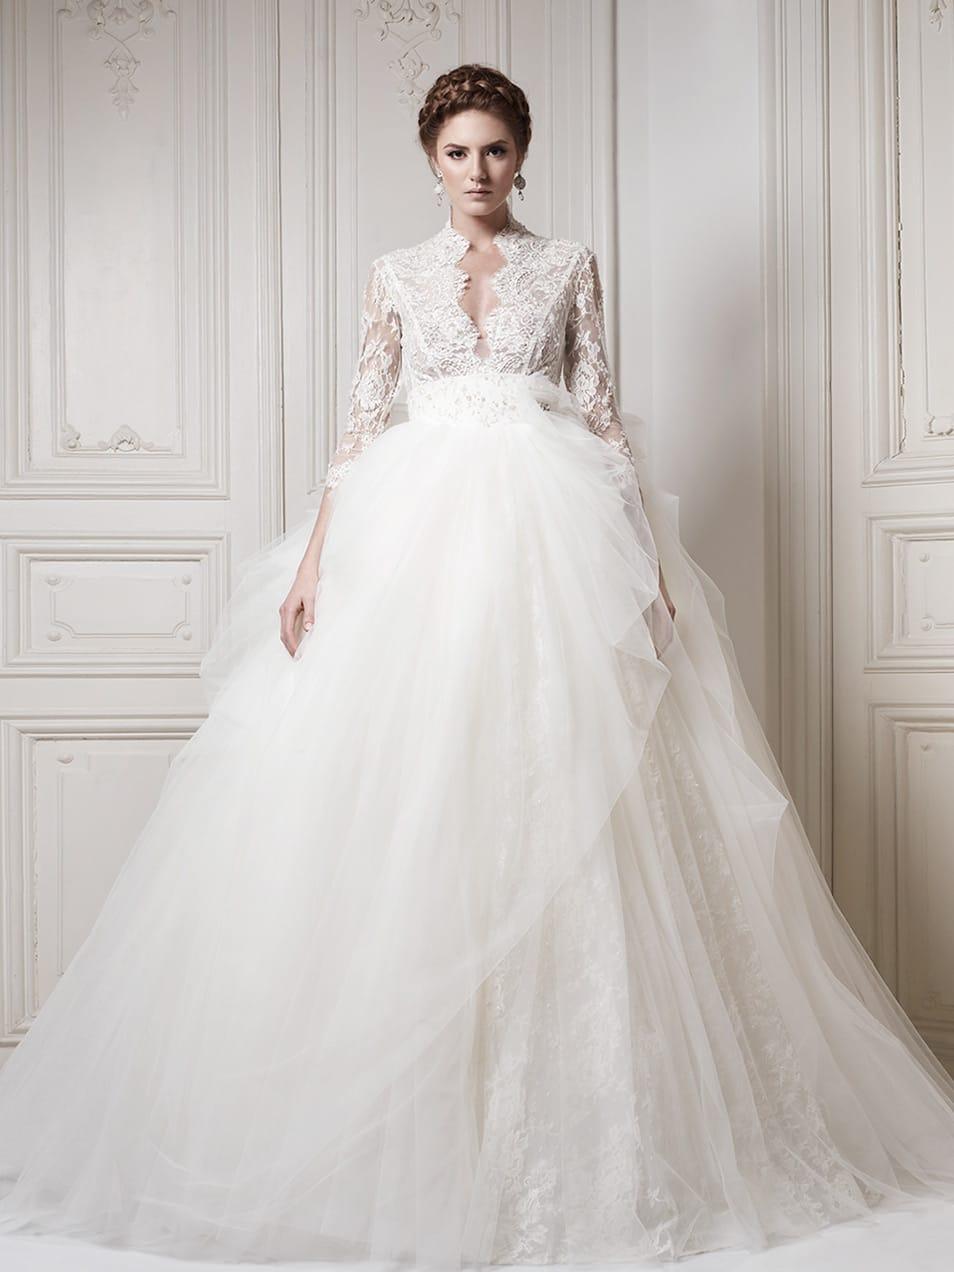 9df4e11bf30 Свадебные платья Ersa Atelier 2016 года